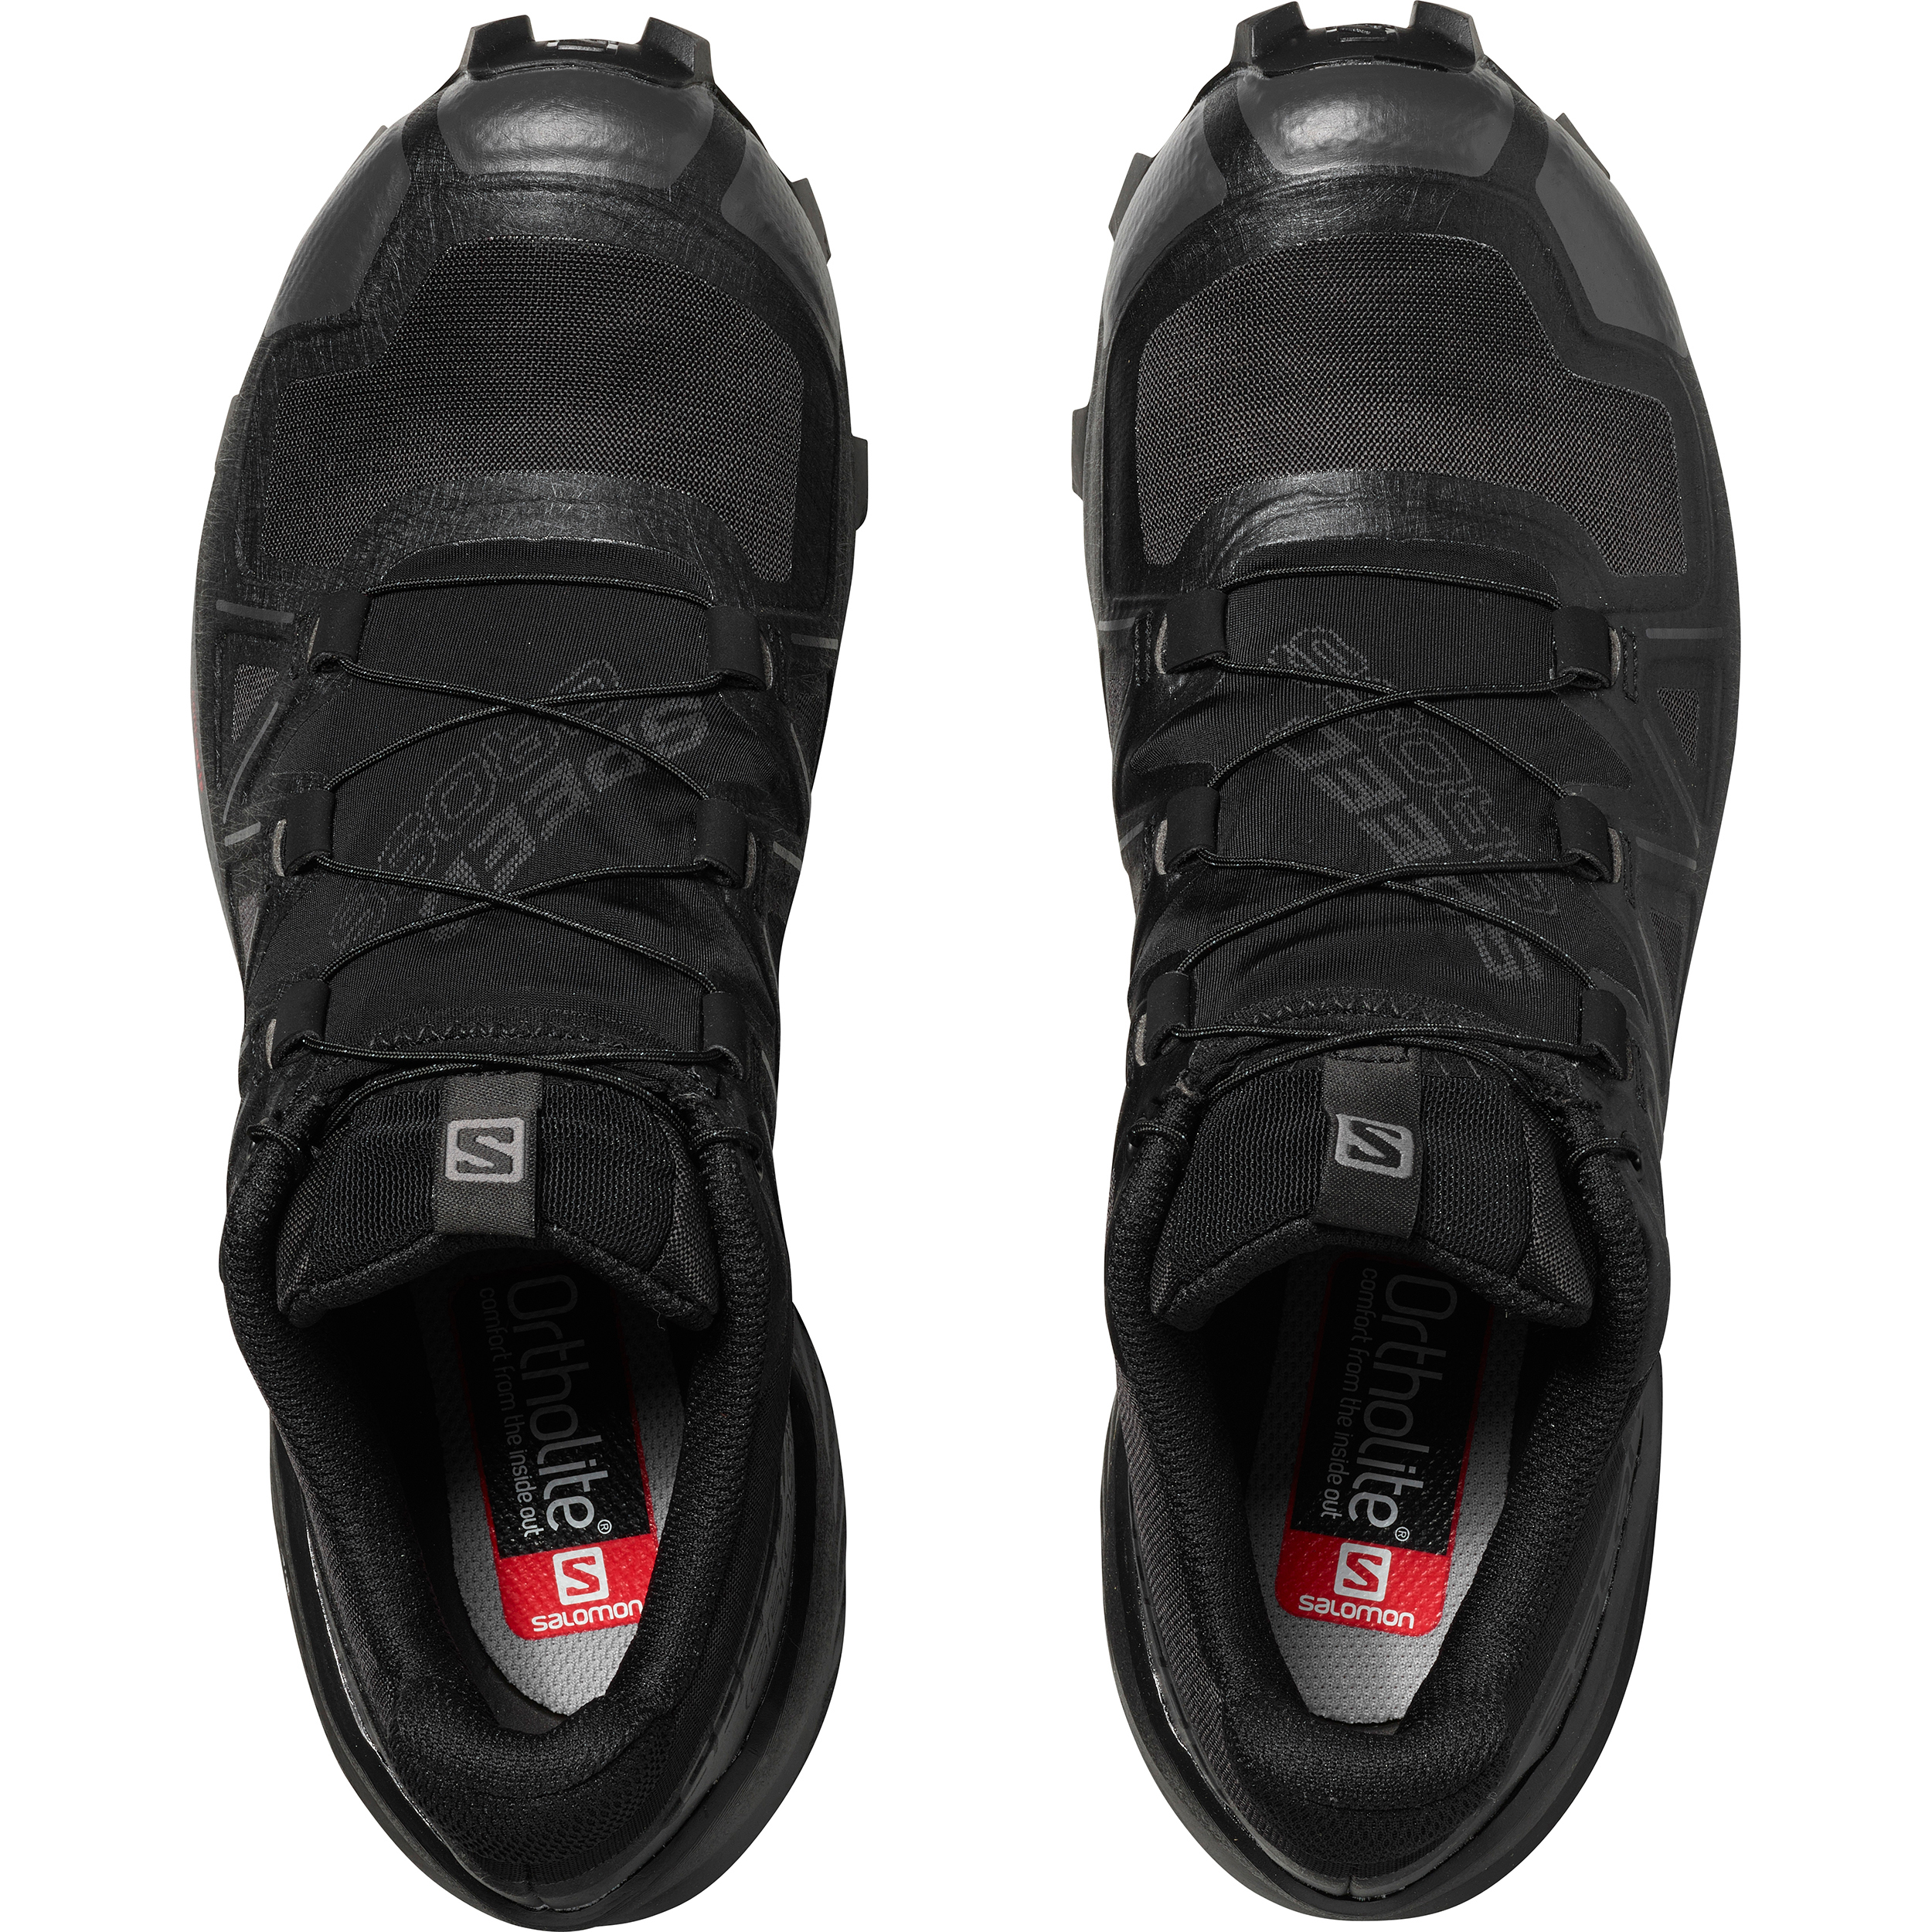 Men's Shoes Converse Cons Breakpoint Pro White Black Suede Skate Shoes KEHJIGXHT